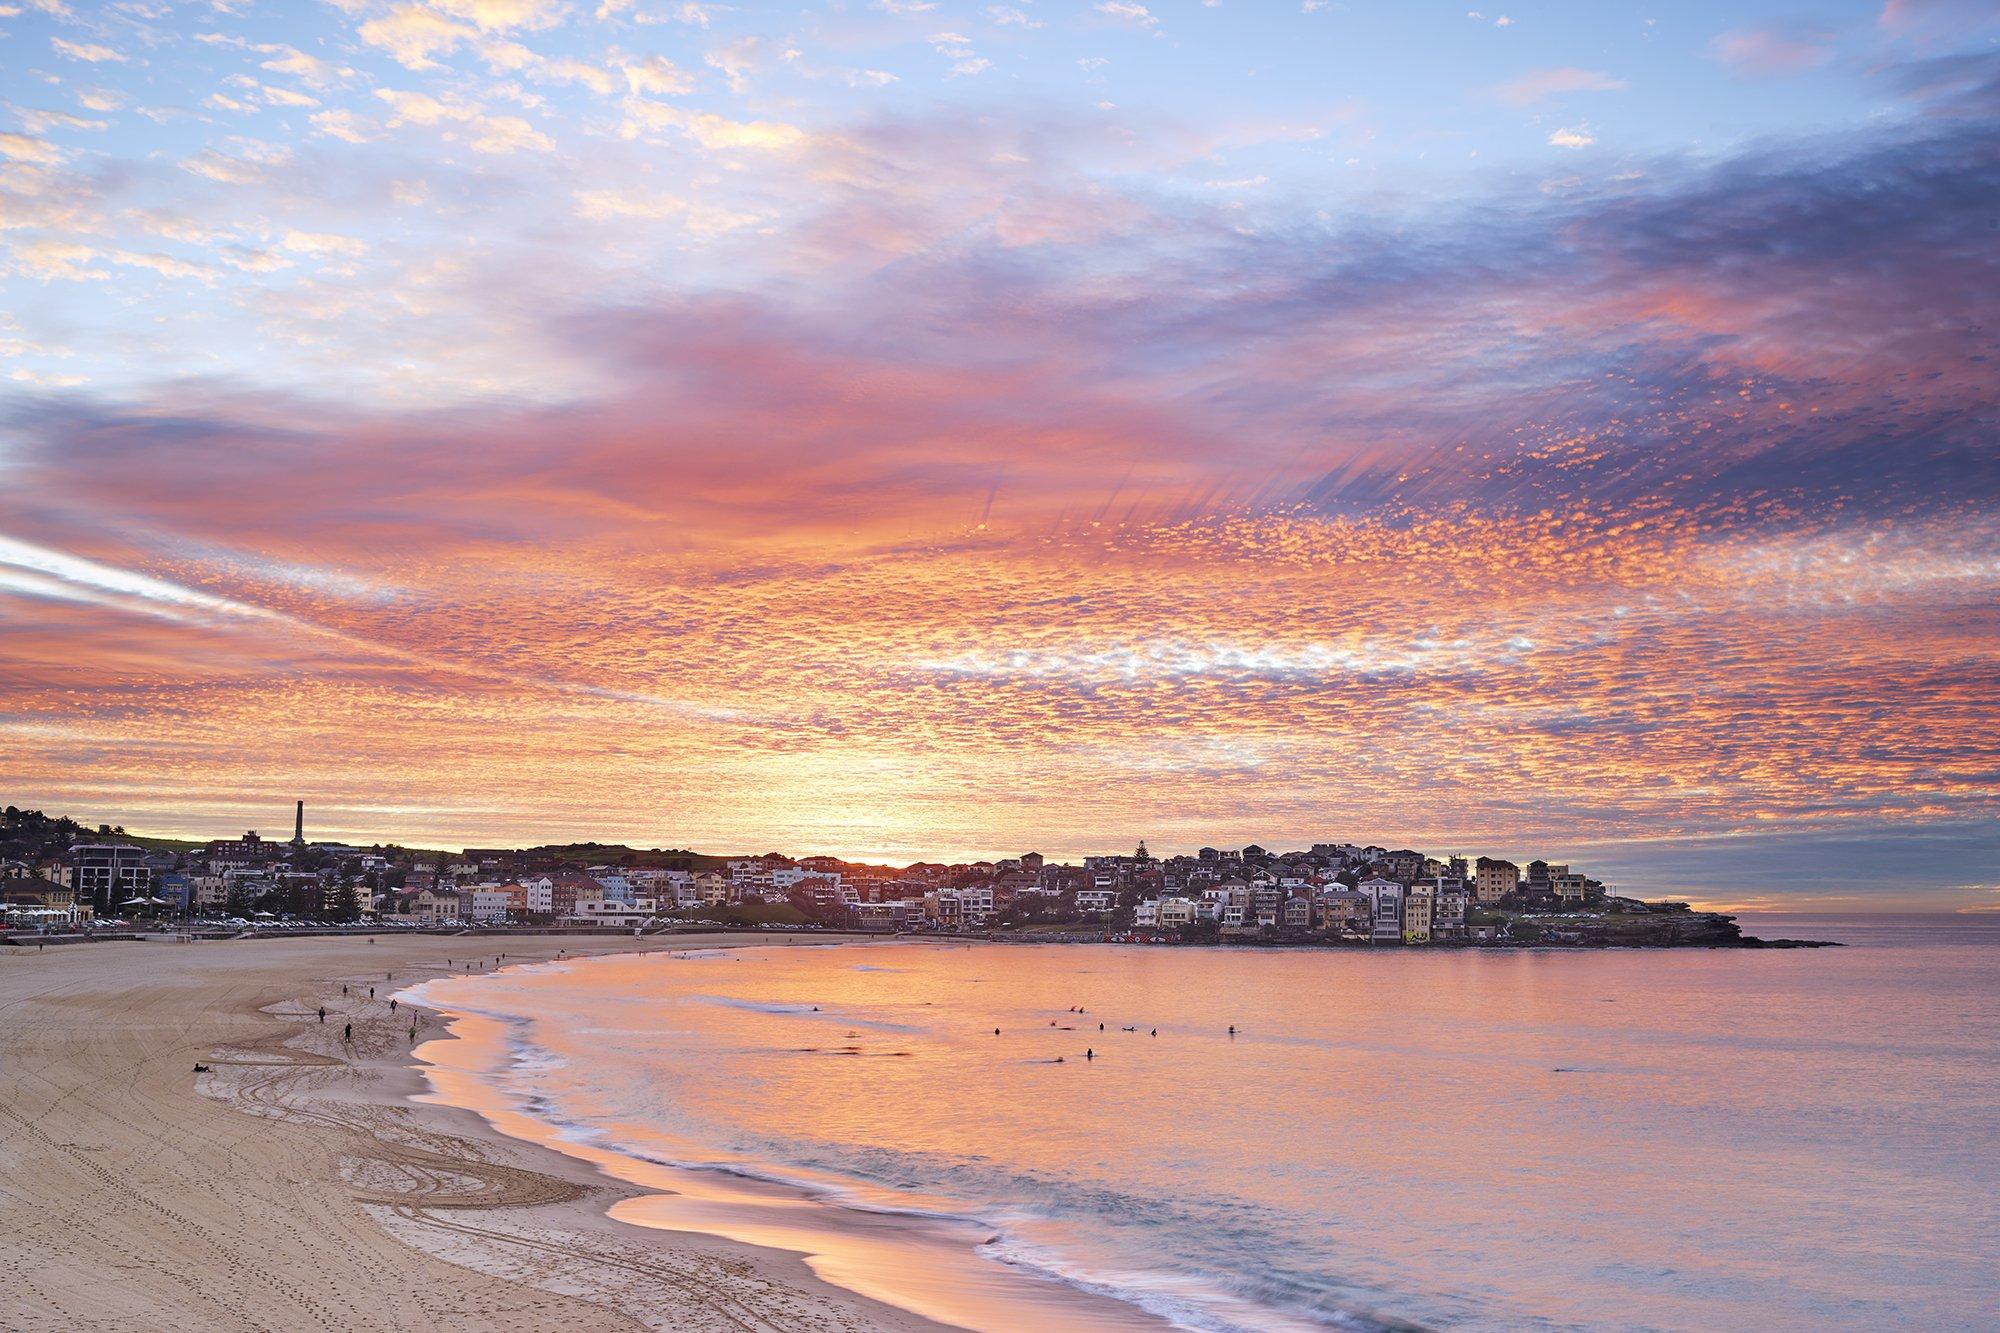 Love the Way You Live - Bondi Beach Sunrise